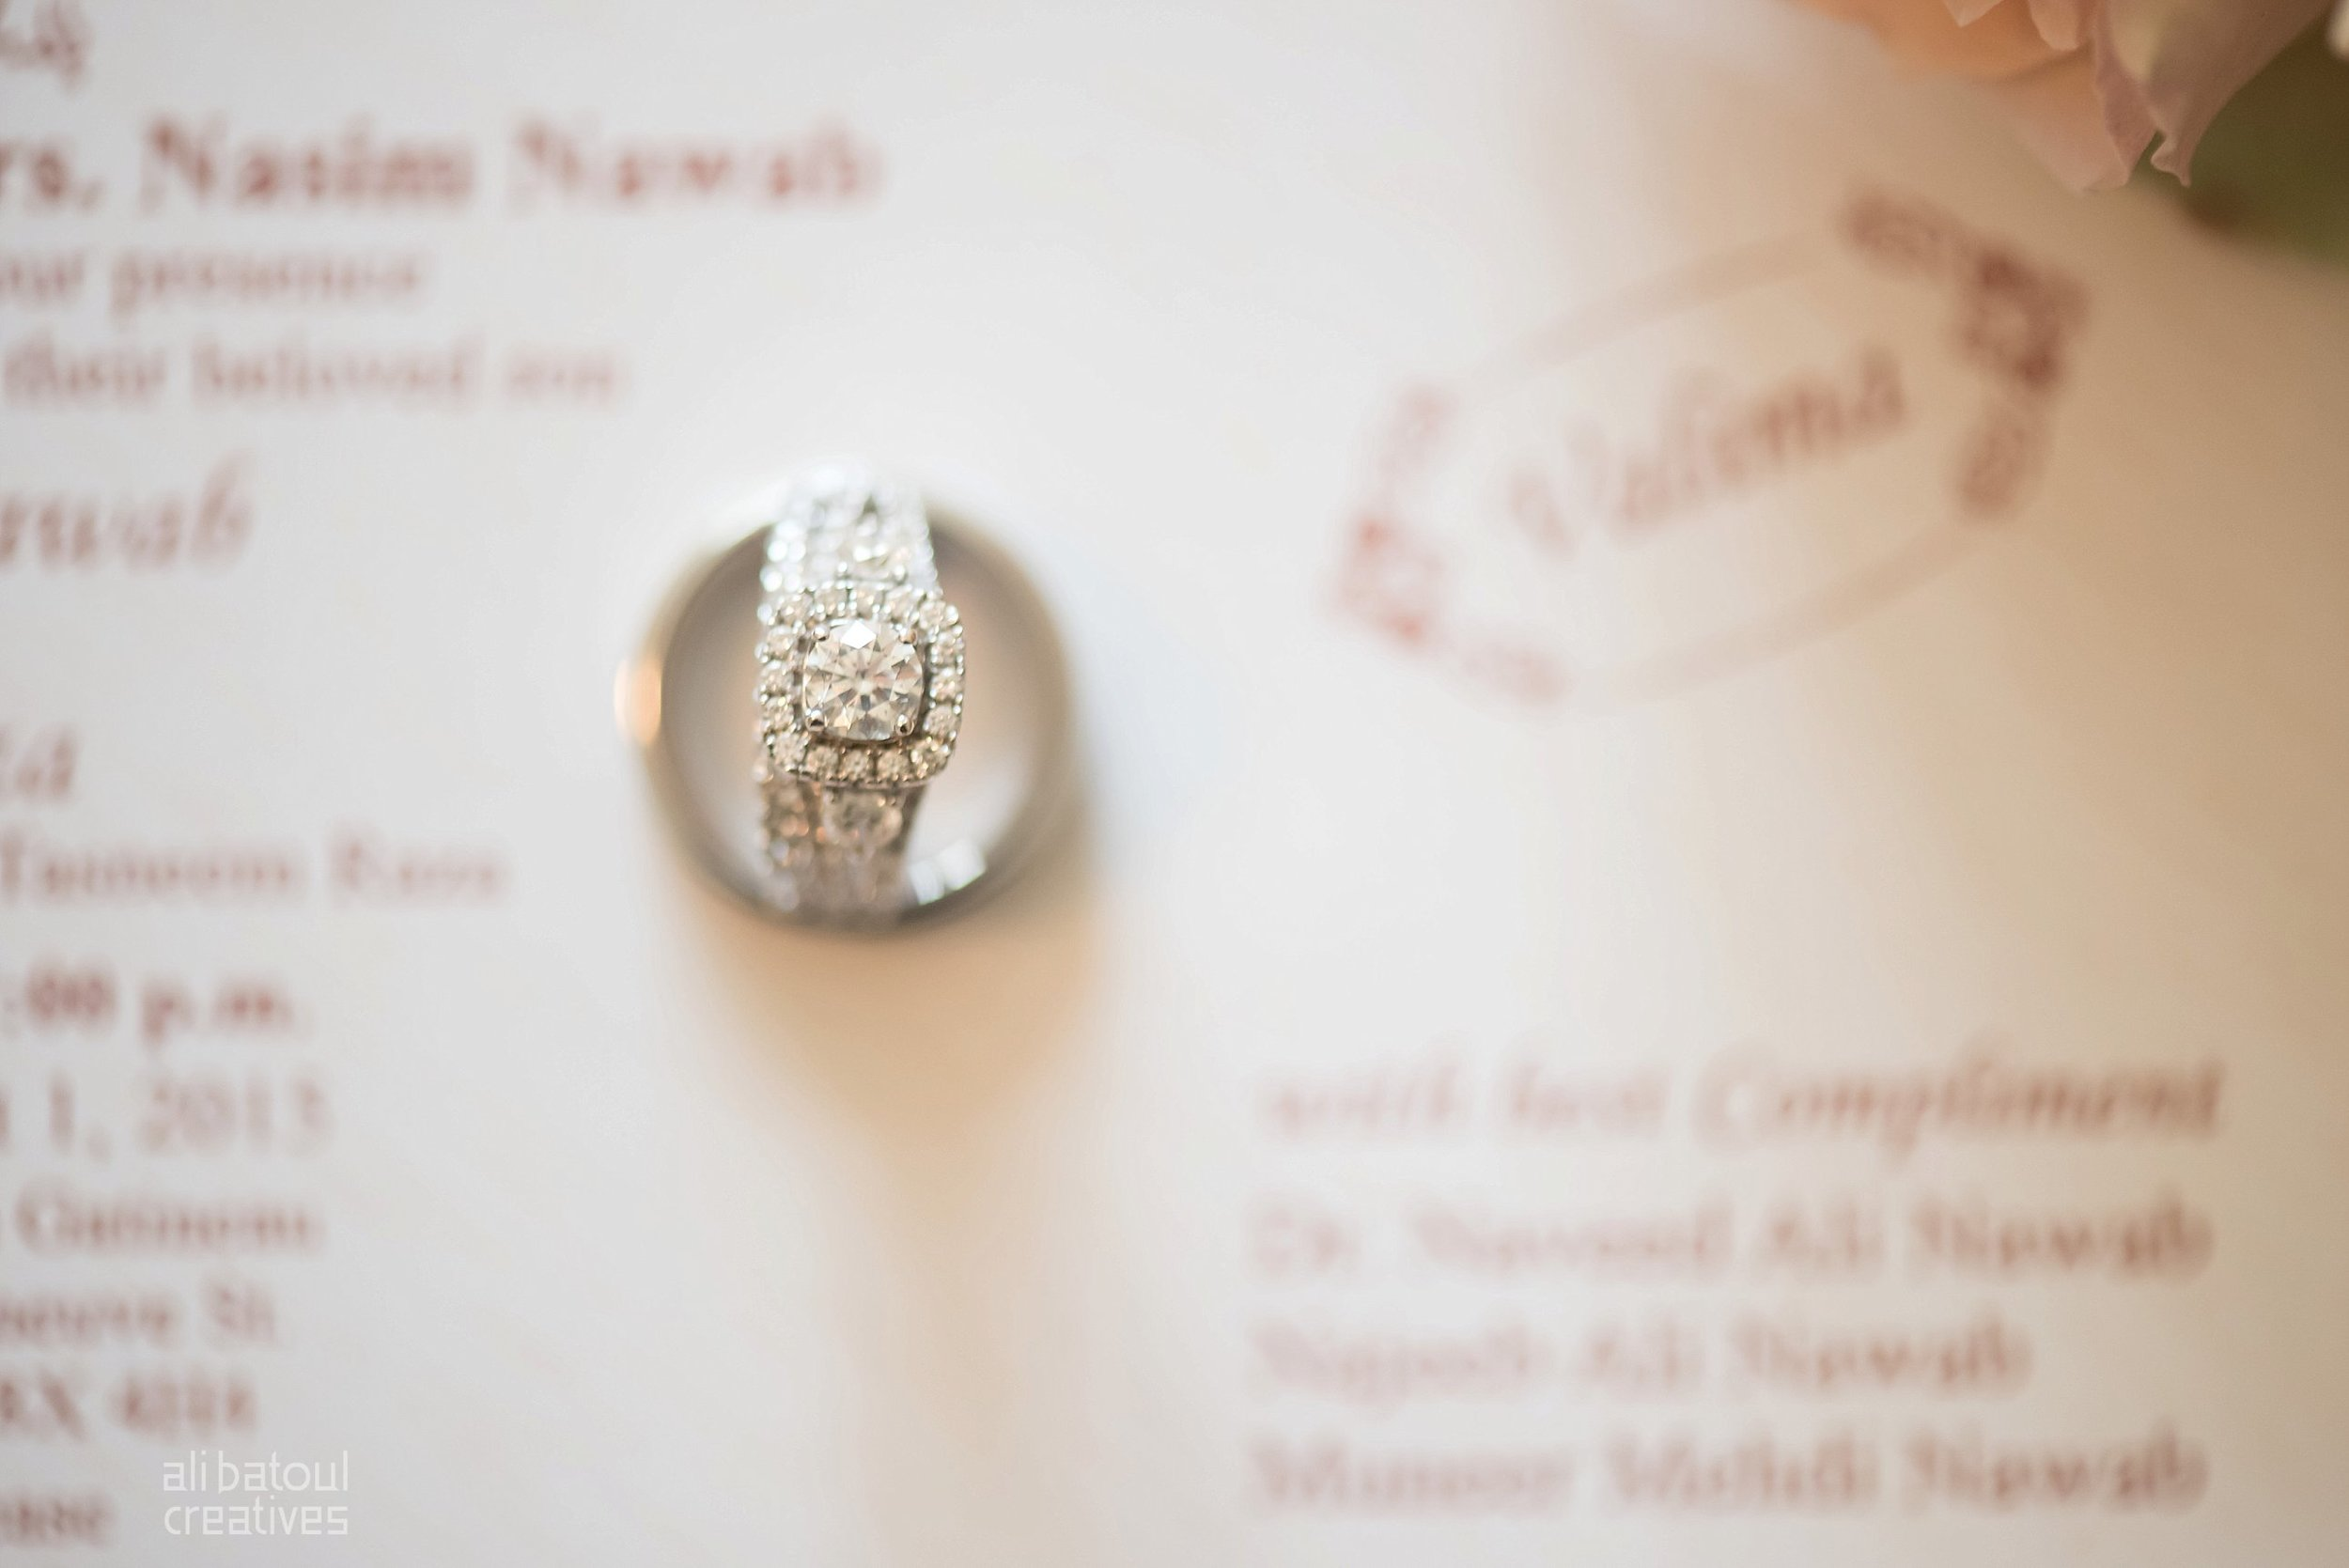 Alina + Mahmood - Ali Batoul Creatives Blog-6_Stomped.jpg